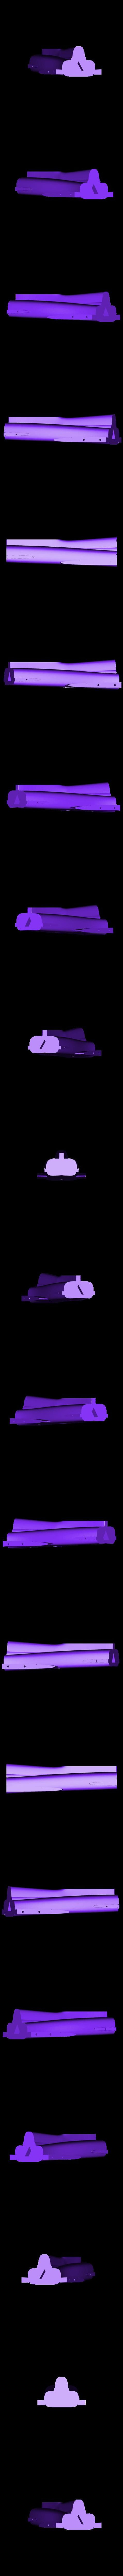 Fuselaje_2.stl Download free STL file Easy to print T-38 Talon aircraft scale model (esc: 1/64) • Design to 3D print, guaro3d